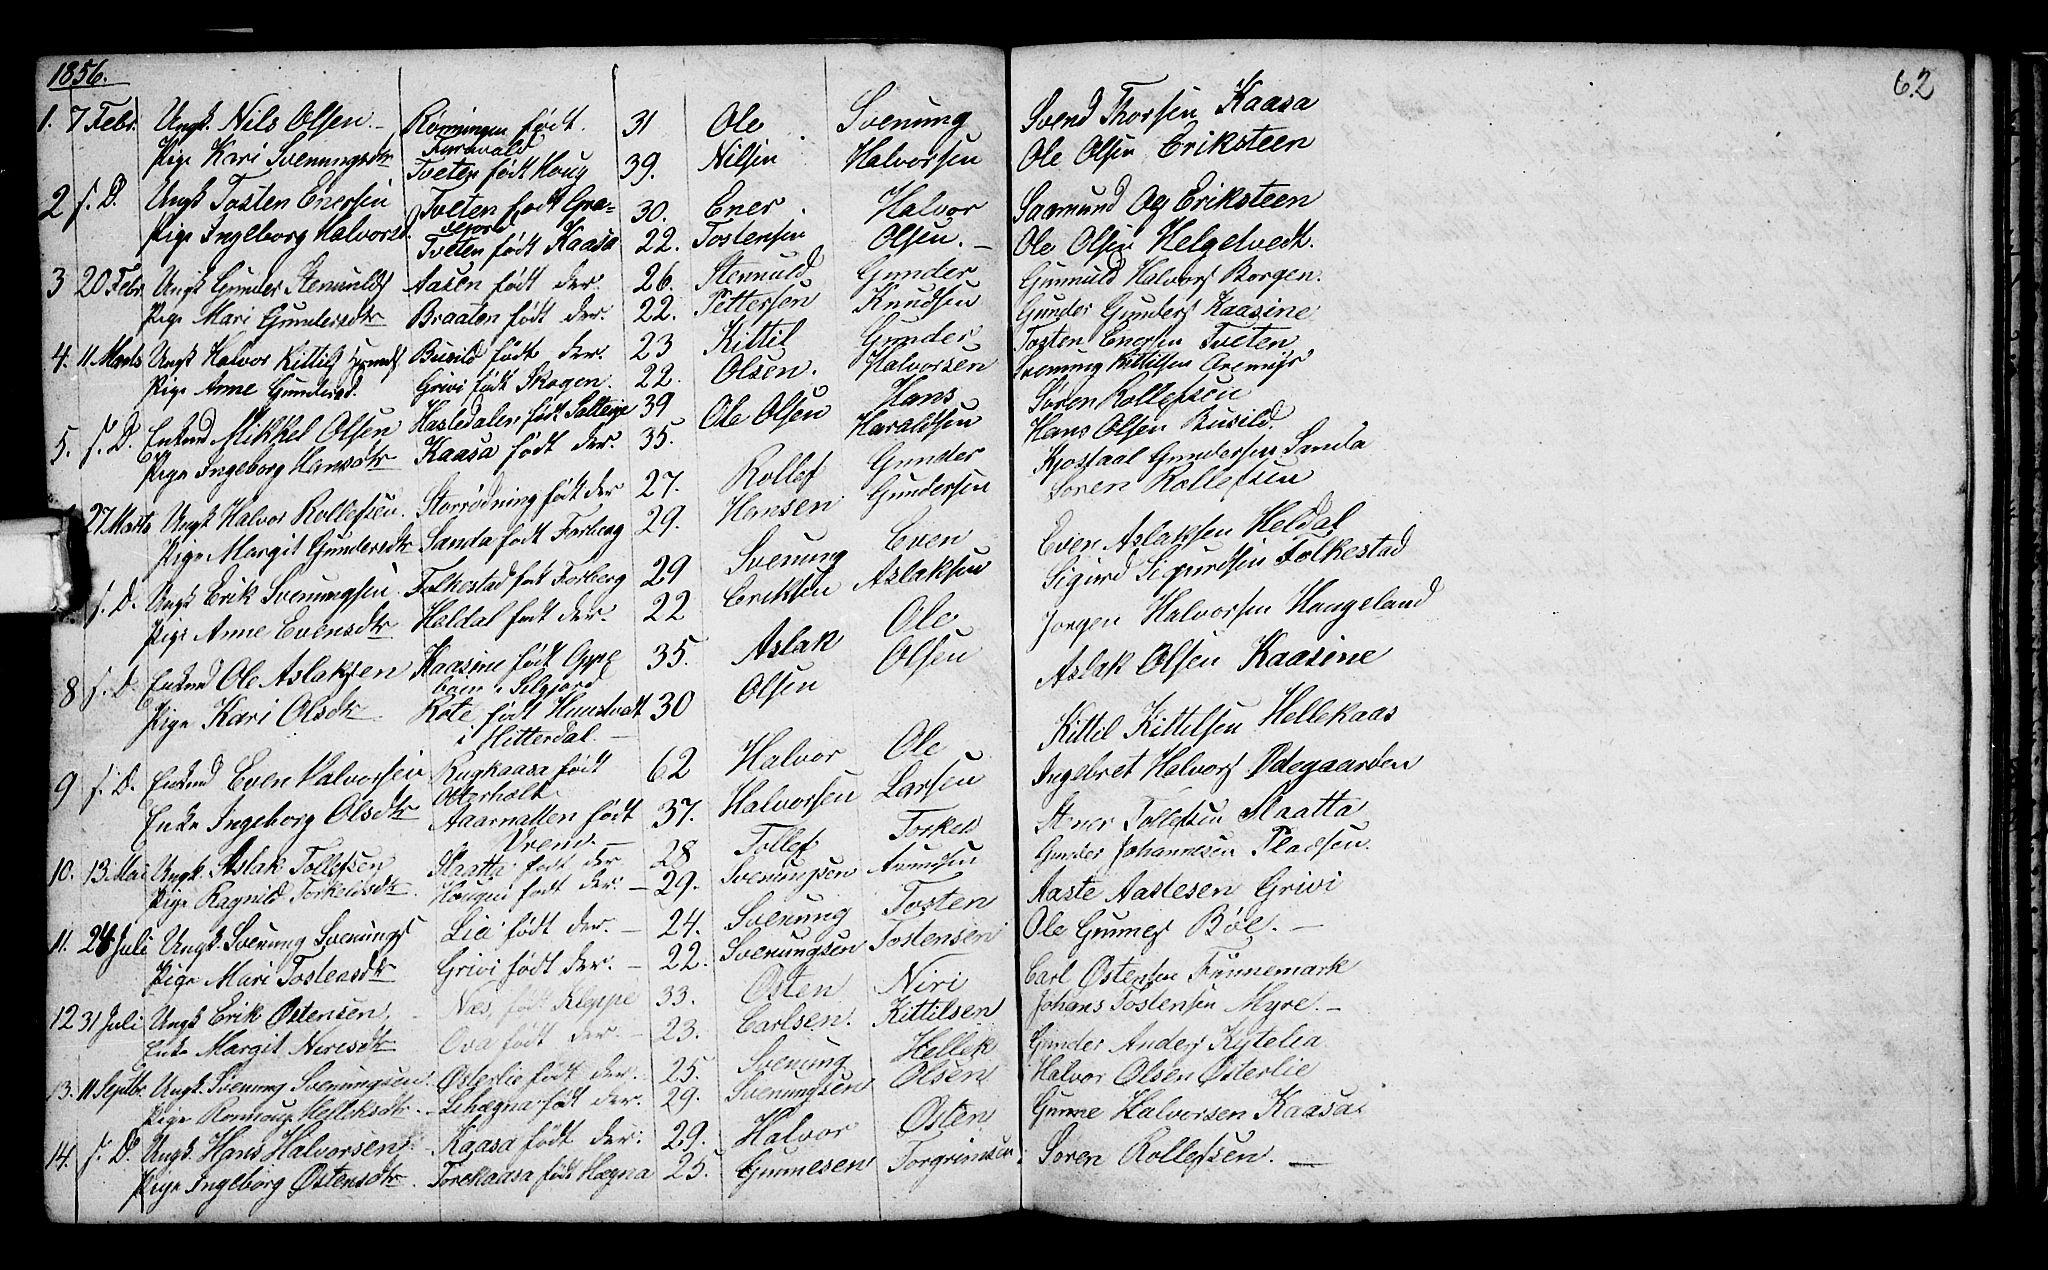 SAKO, Bø kirkebøker, G/Ga/L0002: Klokkerbok nr. 2, 1853-1866, s. 62